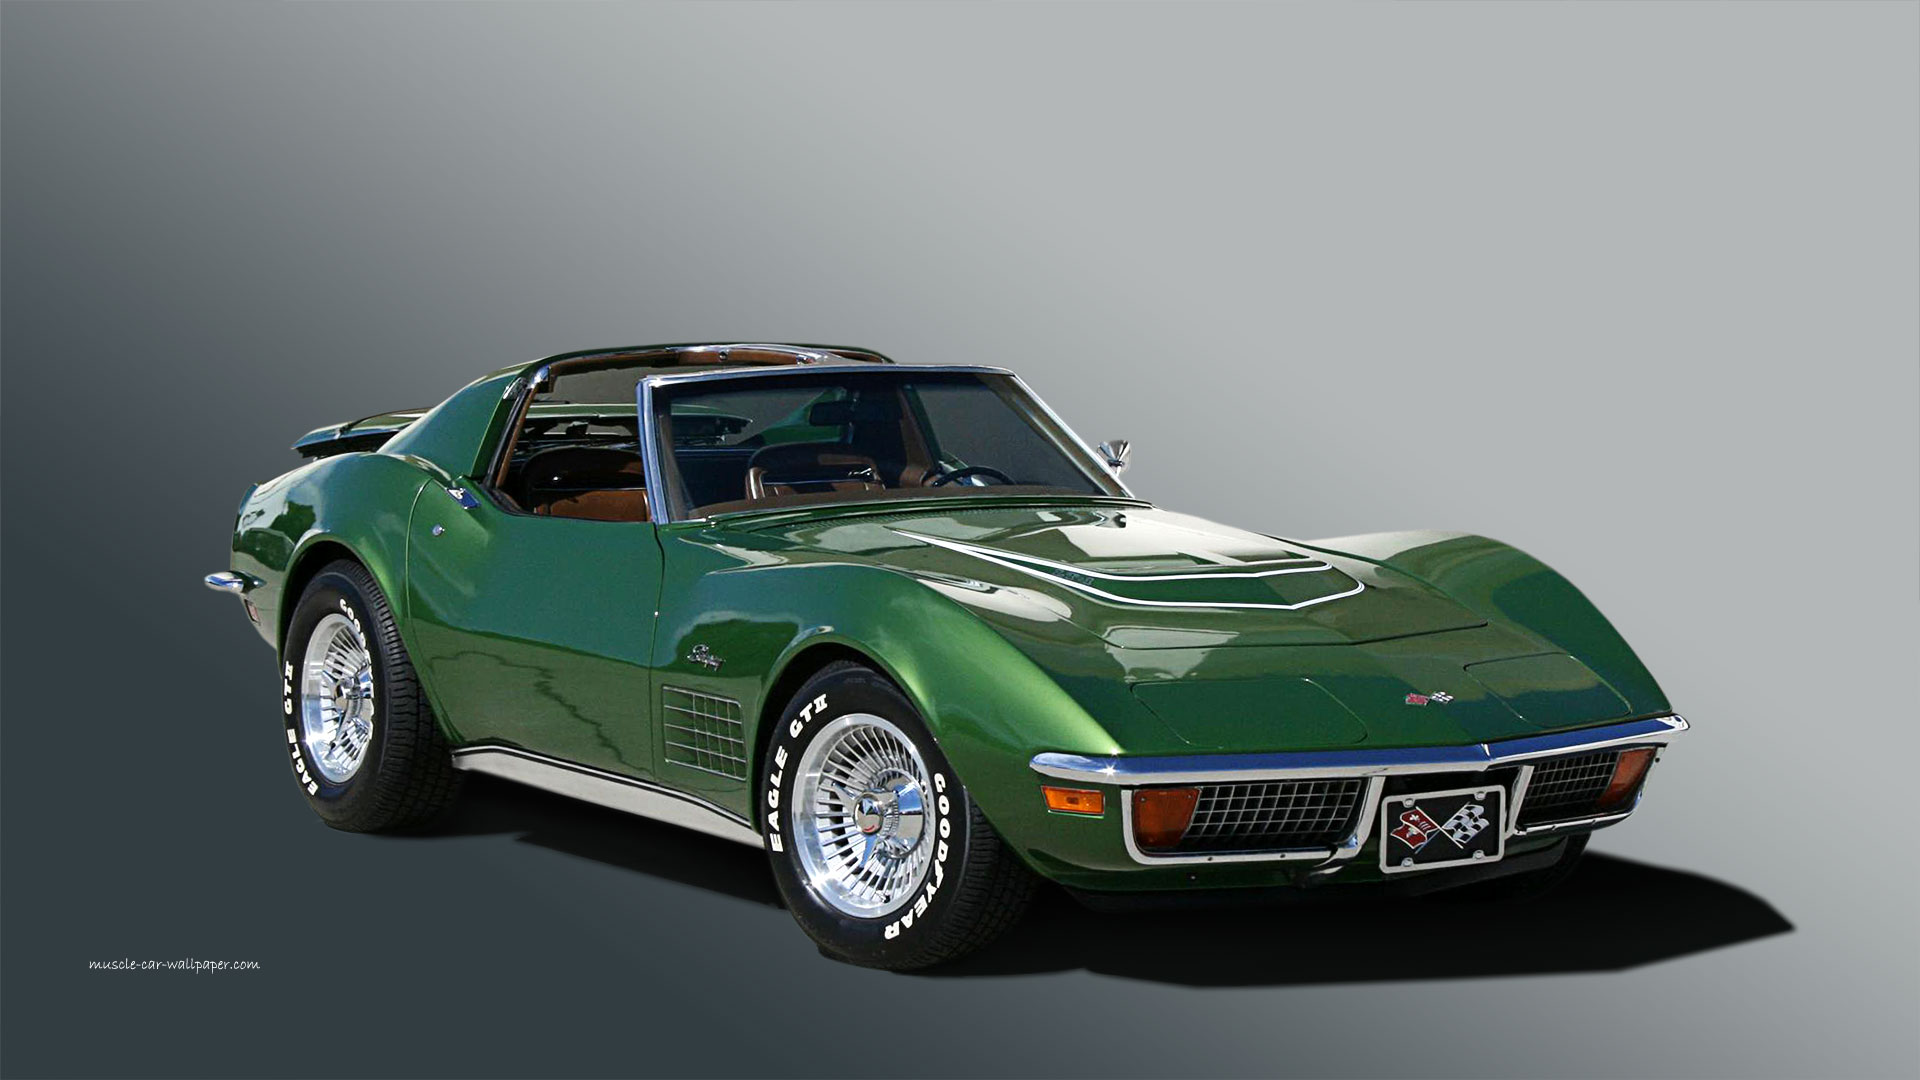 Corvette Wallpaper, 1972 - Right Side View | 1920_08